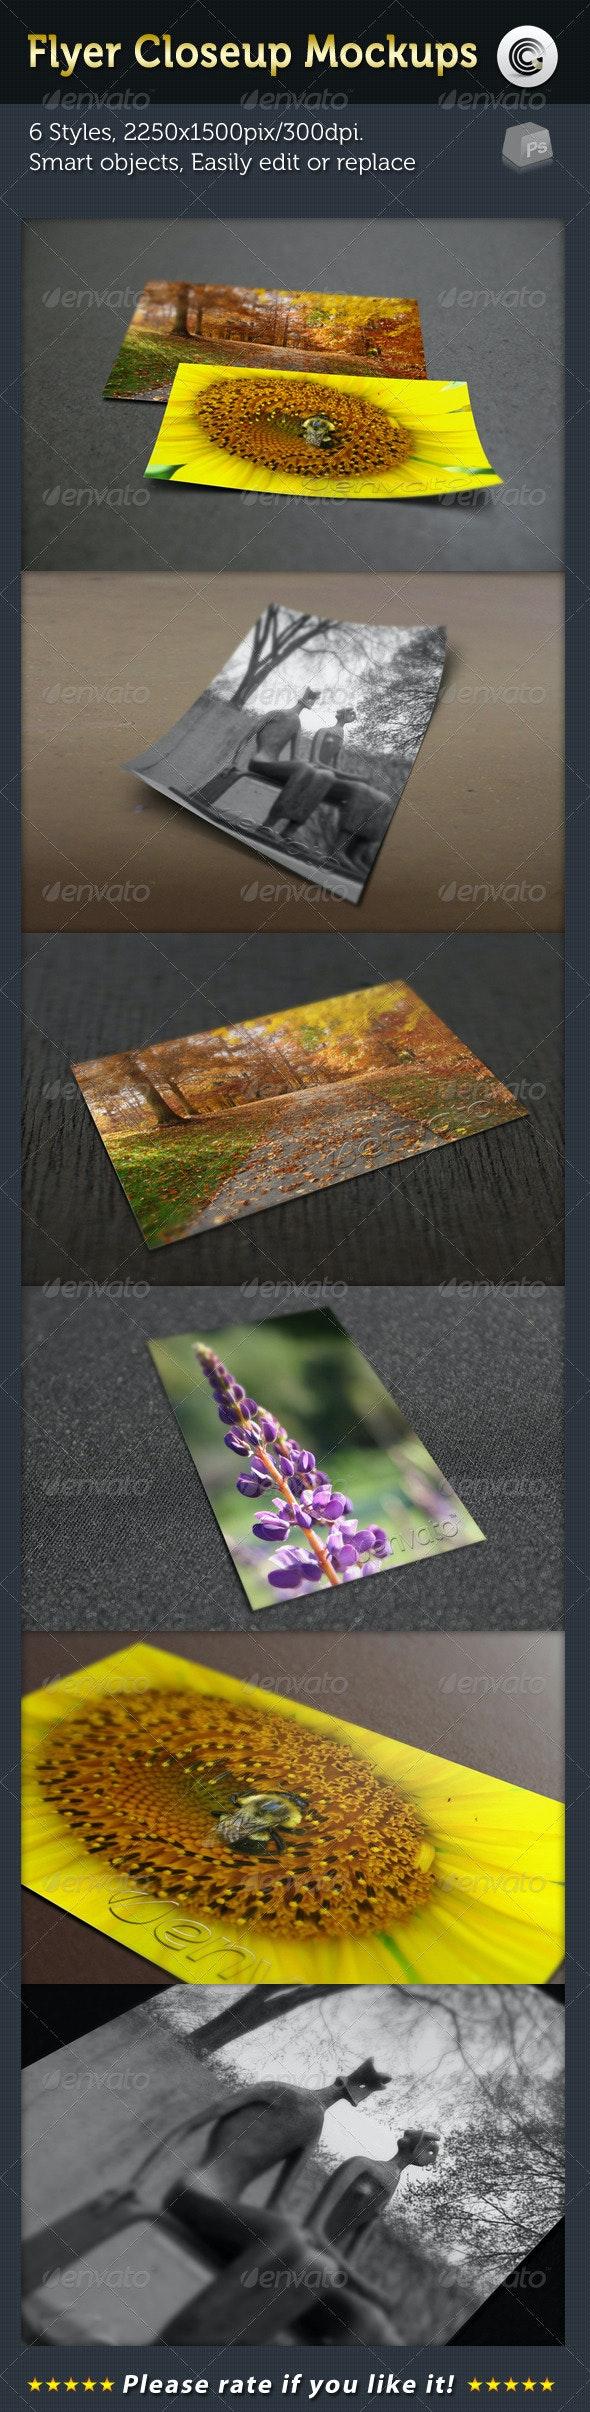 Flyer Closeup Mock-ups - Flyers Print